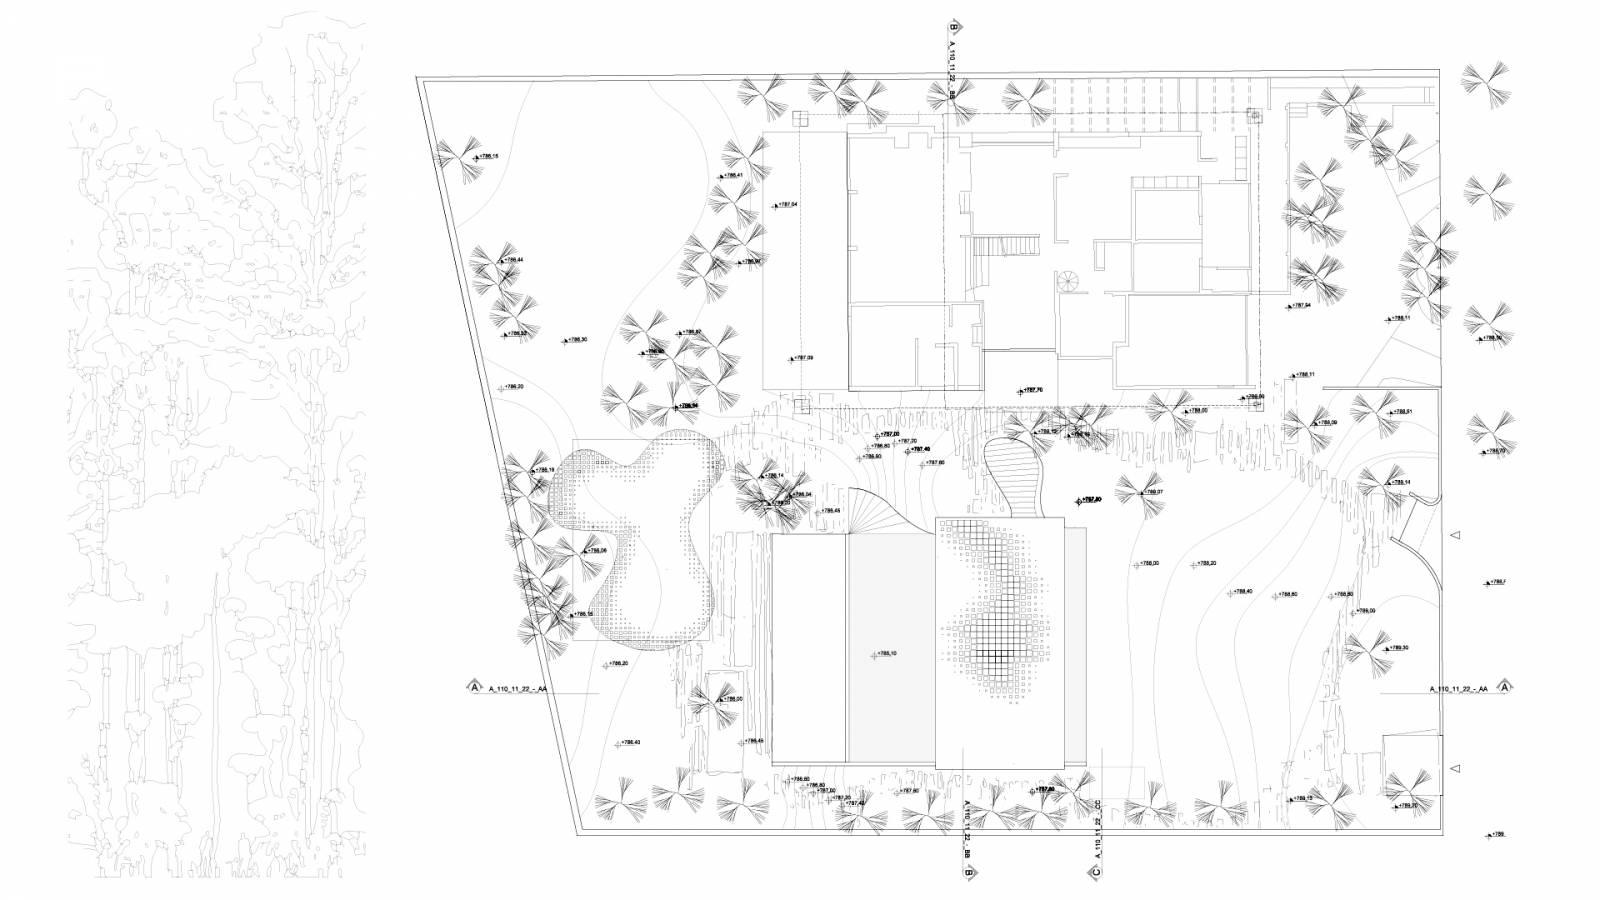 GARDEN PLAN - São Paulo Art Pavillion - SPOL Architects